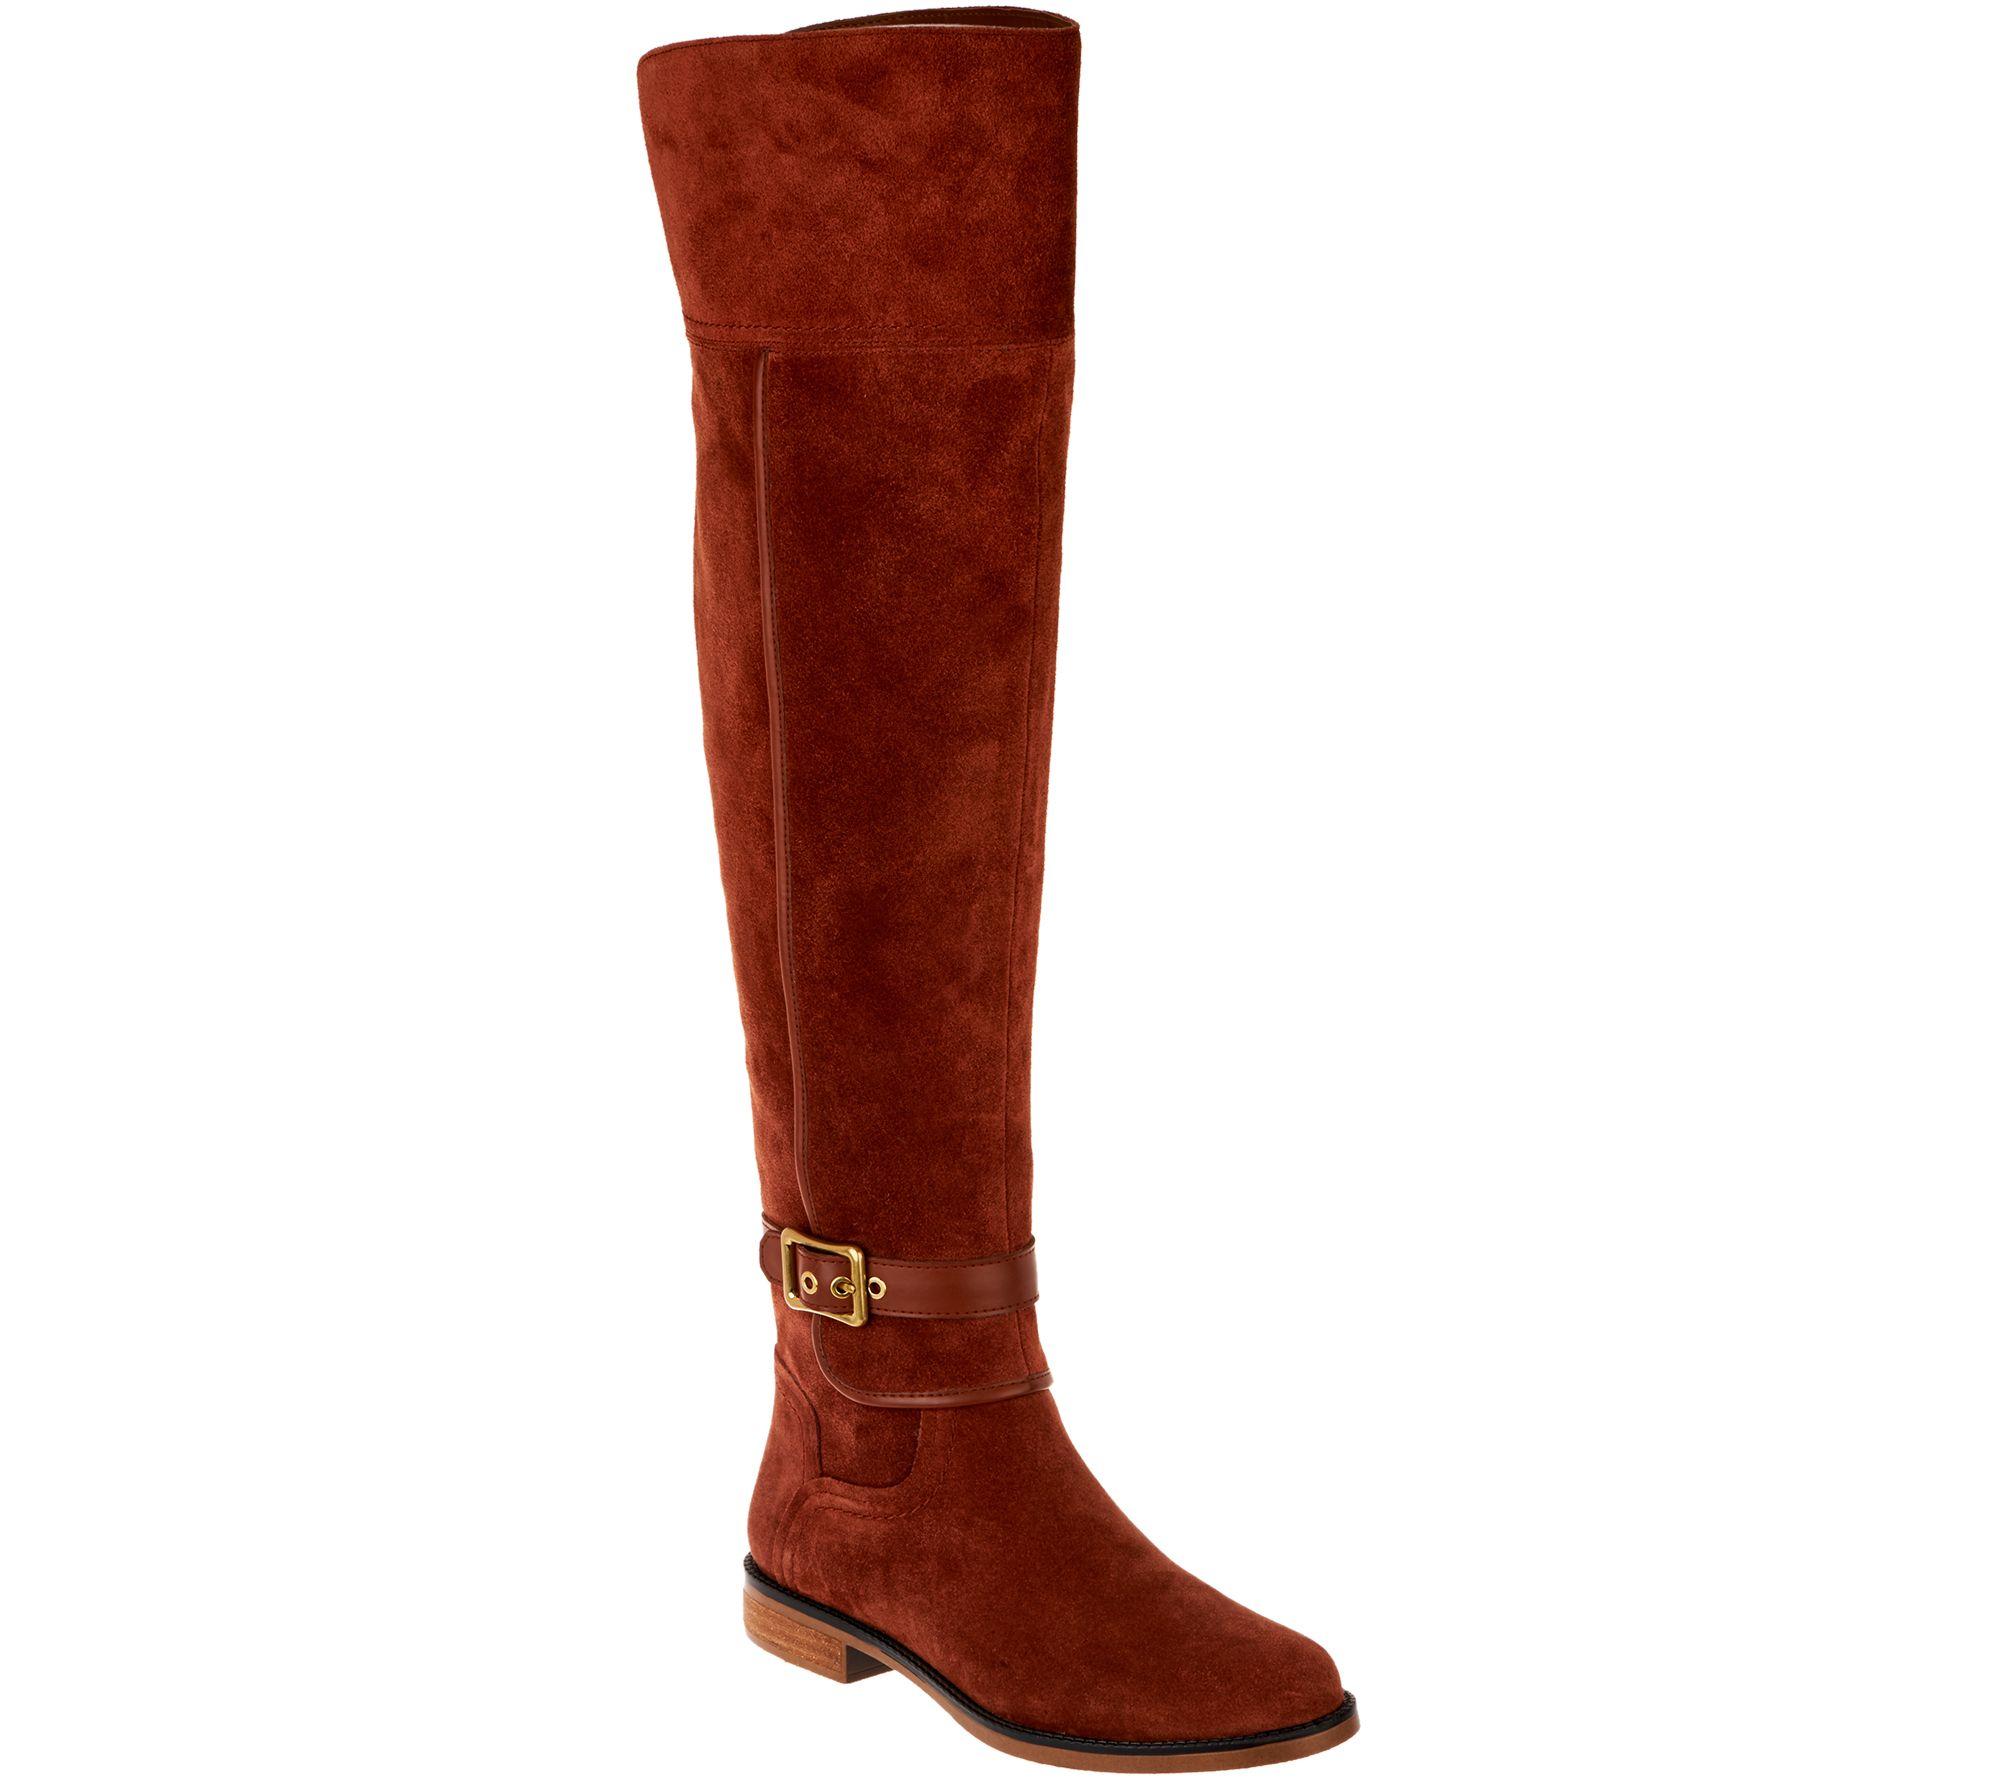 c17c1c1f18ba Franco Sarto Wide Calf Suede Over-the-Knee Boots - Crimson - Page 1 —  QVC.com